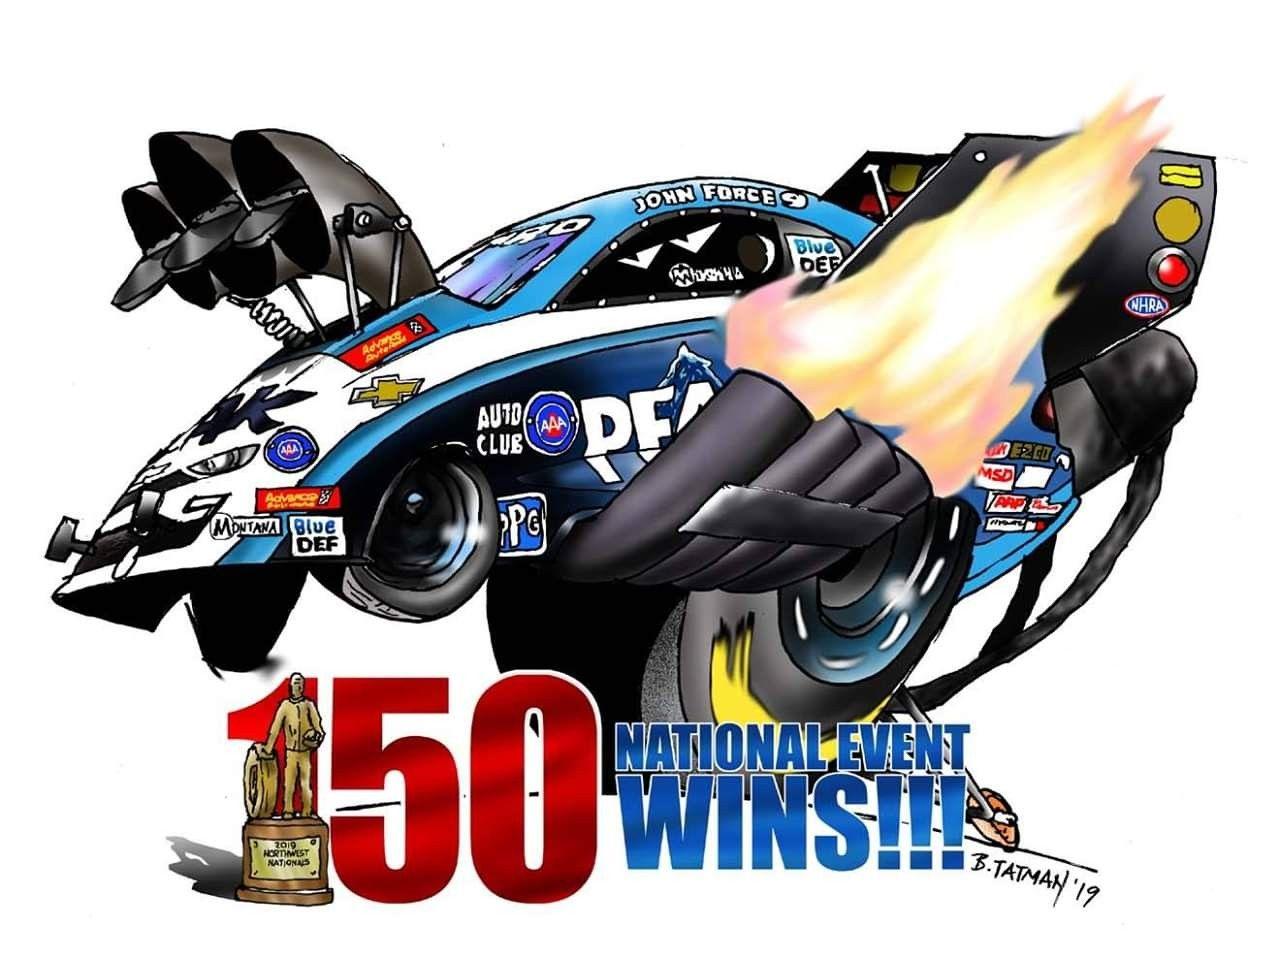 Pin By Larry Ramsey On Nhra Nhra Drag Racing Cars Drag Racing Cars Funny Car Drag Racing